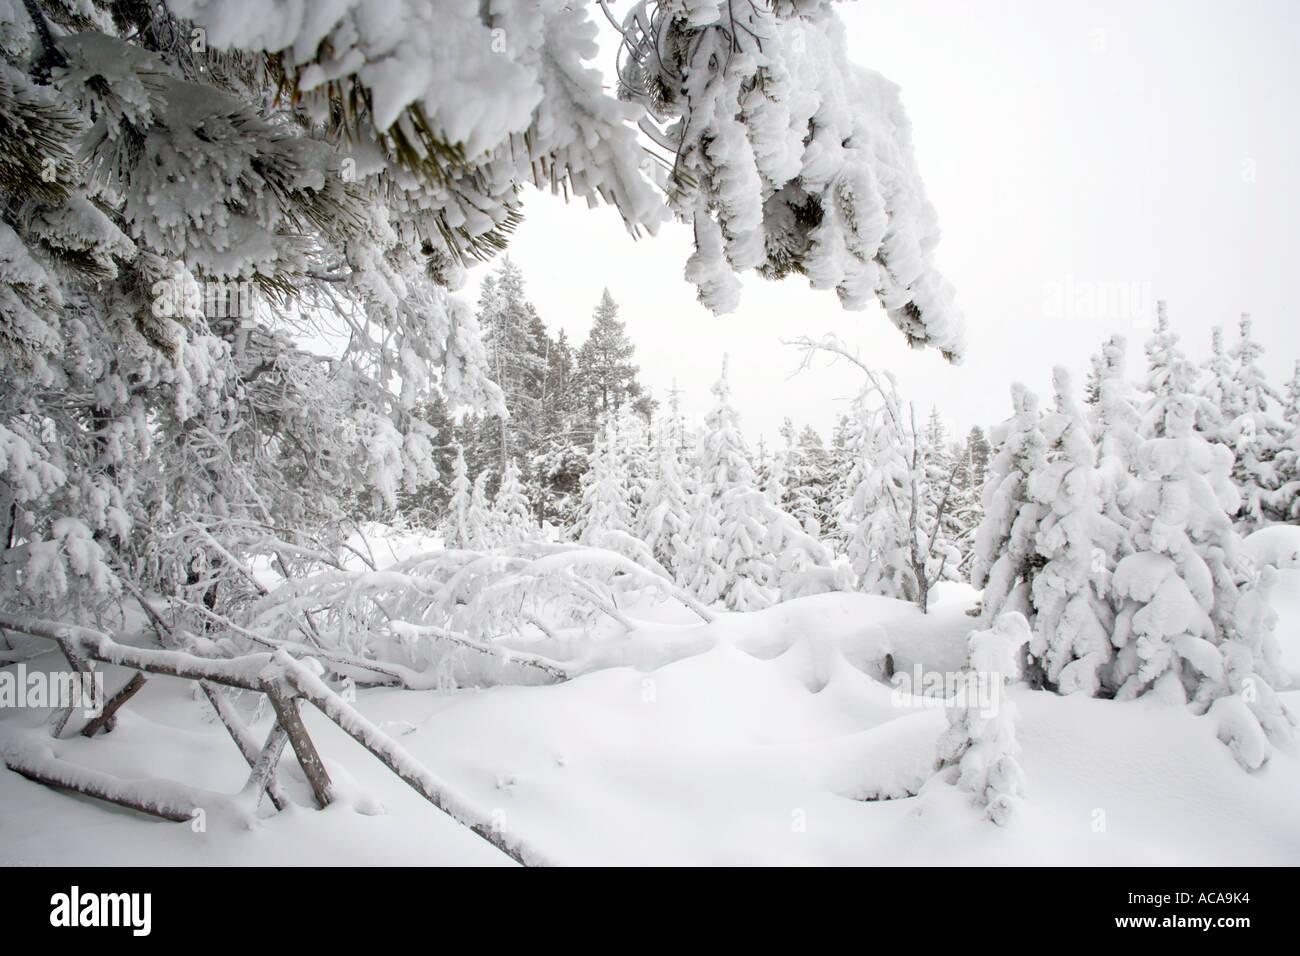 64c328b87 Winter Scene in Heavy Snow at Yellowstone National Park, Wyoming ...